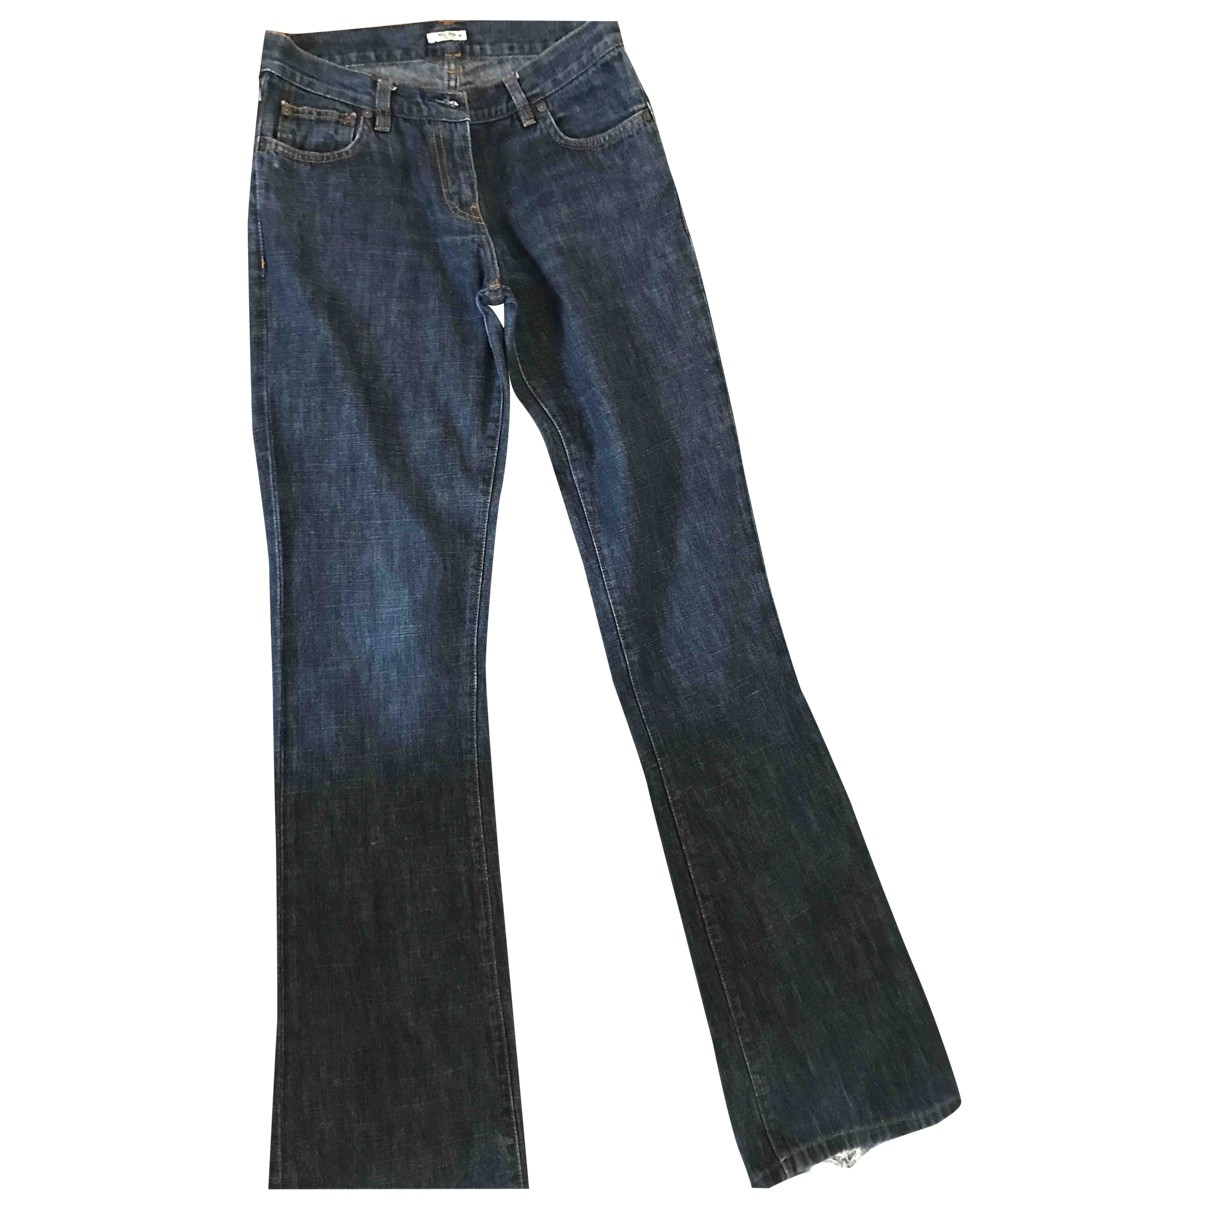 Miu Miu \N Blue Denim - Jeans Trousers for Women 38 FR